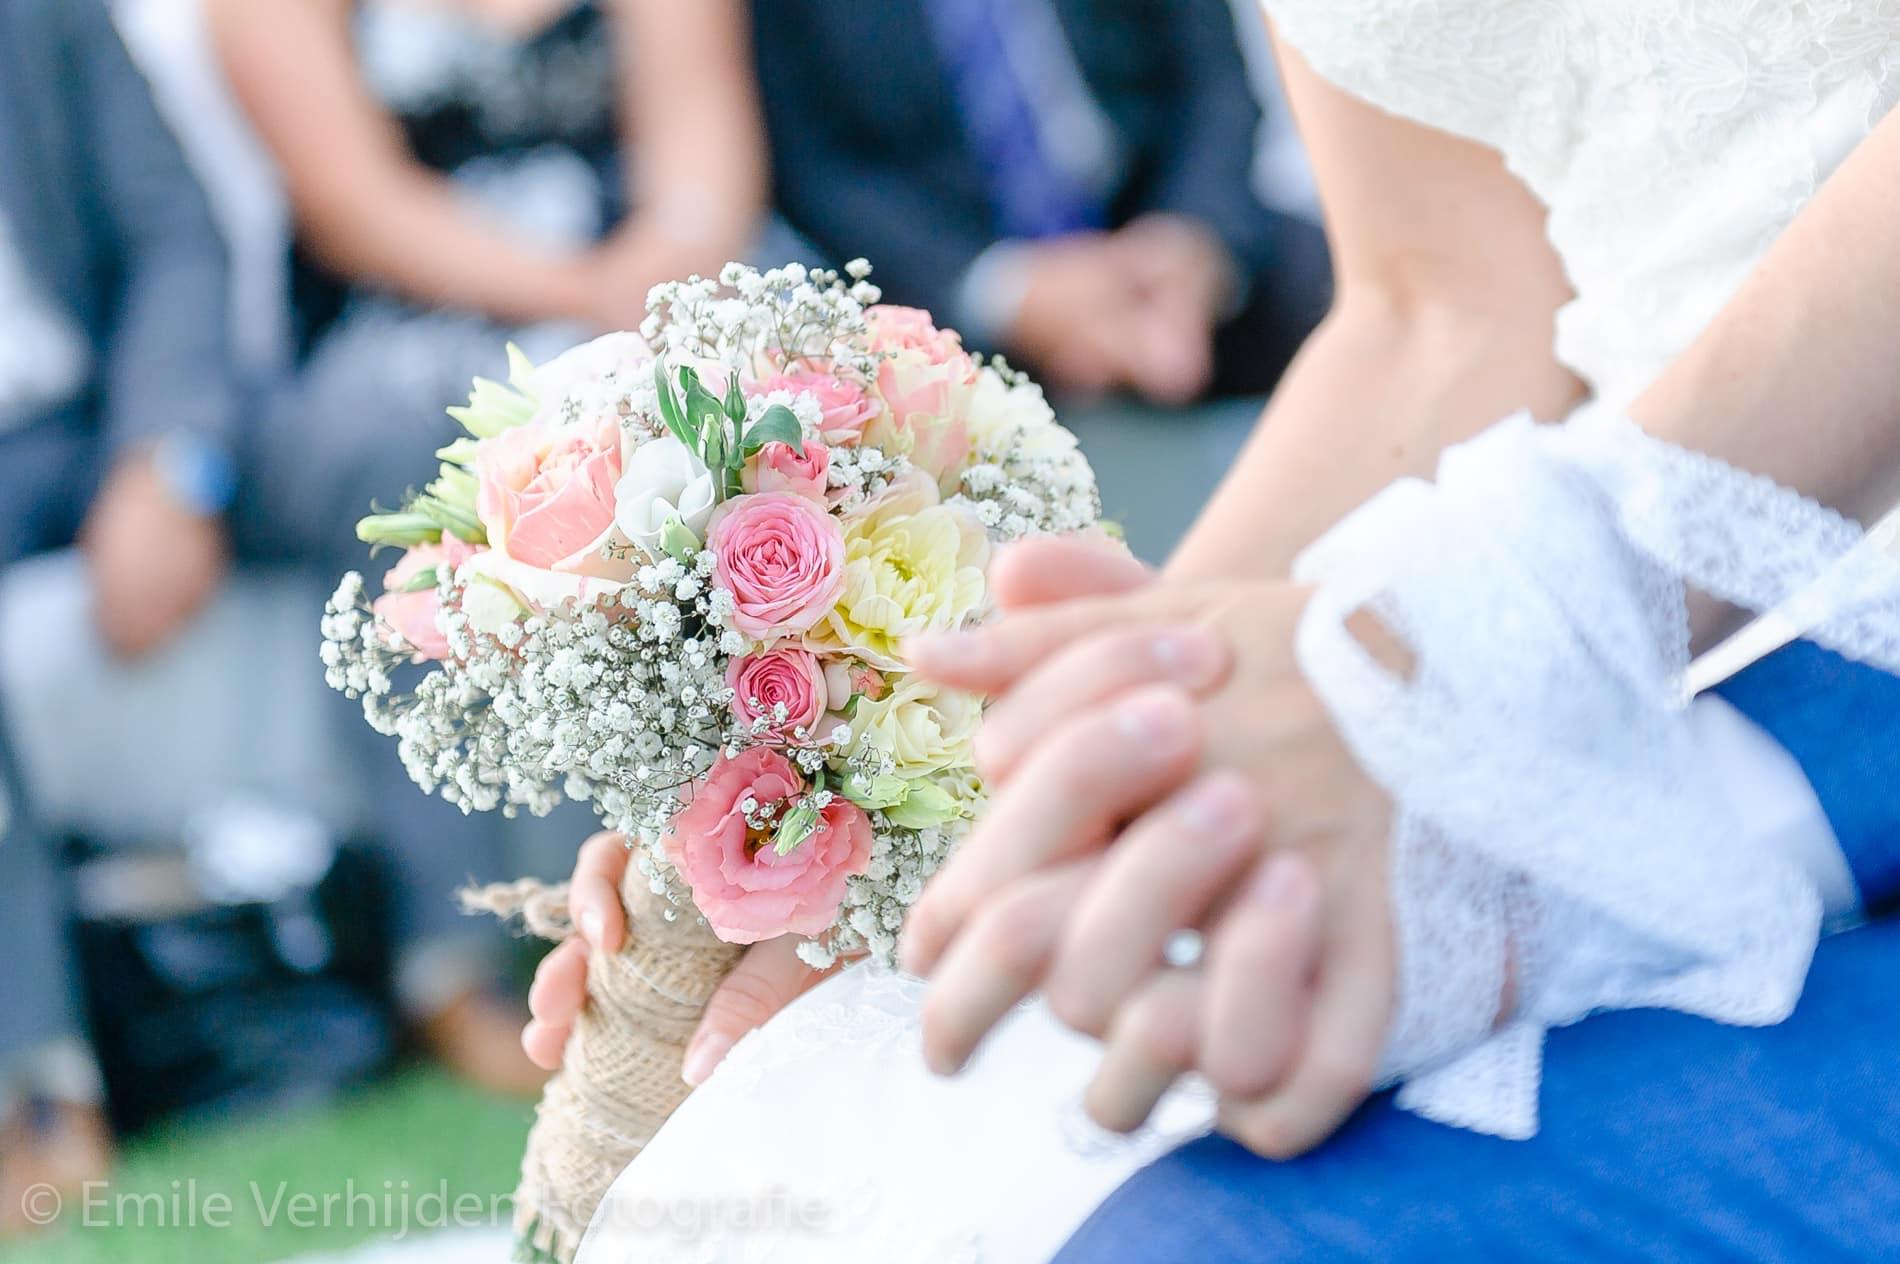 Closeup bruidsboeket tijdens de ceremonie - Bruidsfotografie Winselerhof Landgraaf - Kerkrade